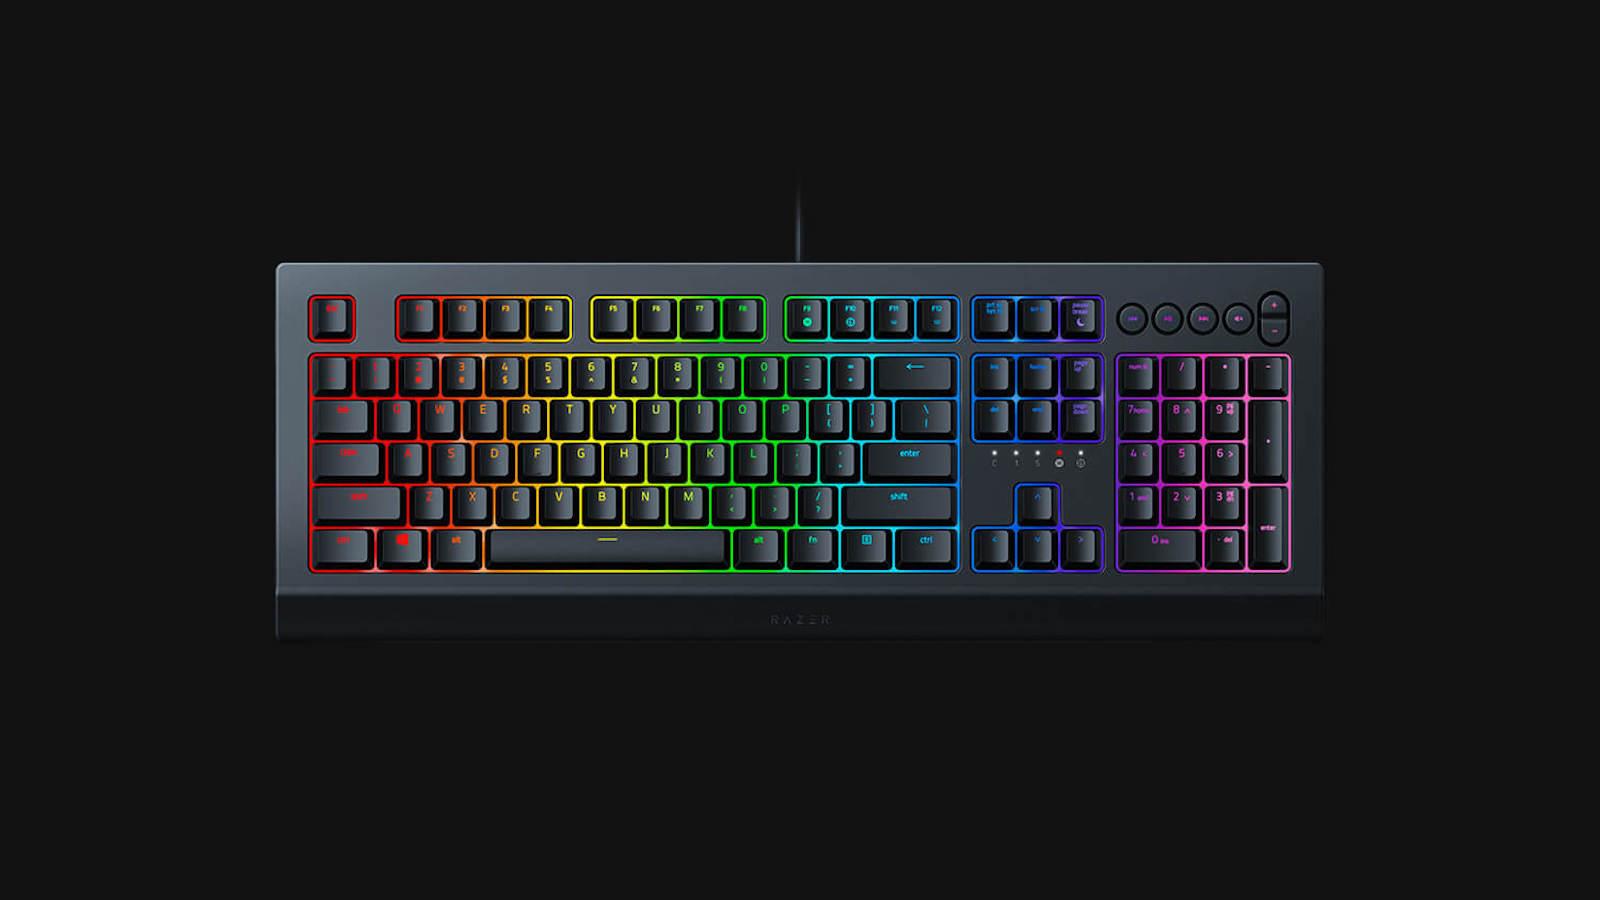 Razer Cynosa V2 RGB gaming keyboard has customizable lighting